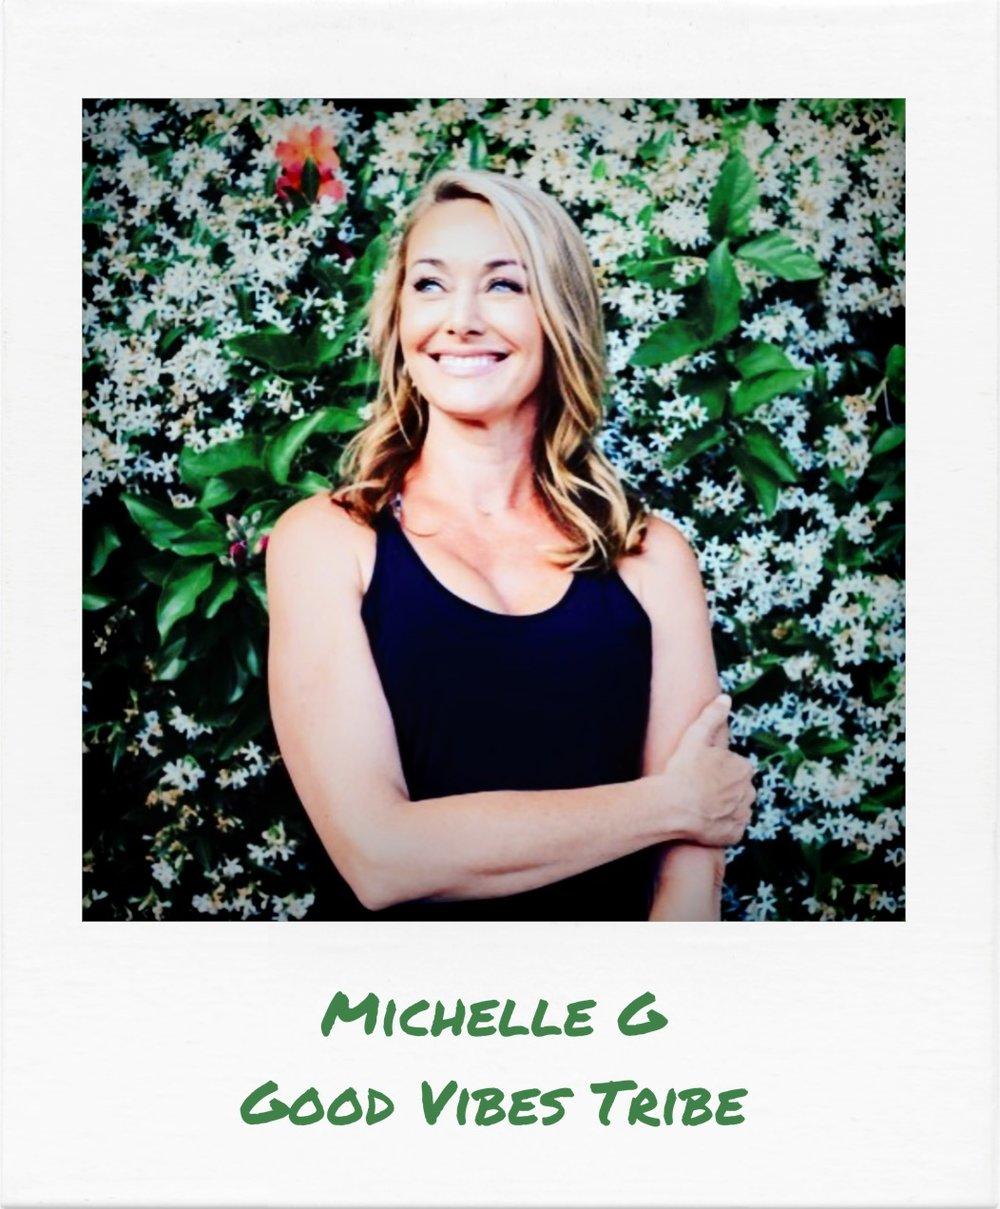 Michelle G GVT 2.jpeg